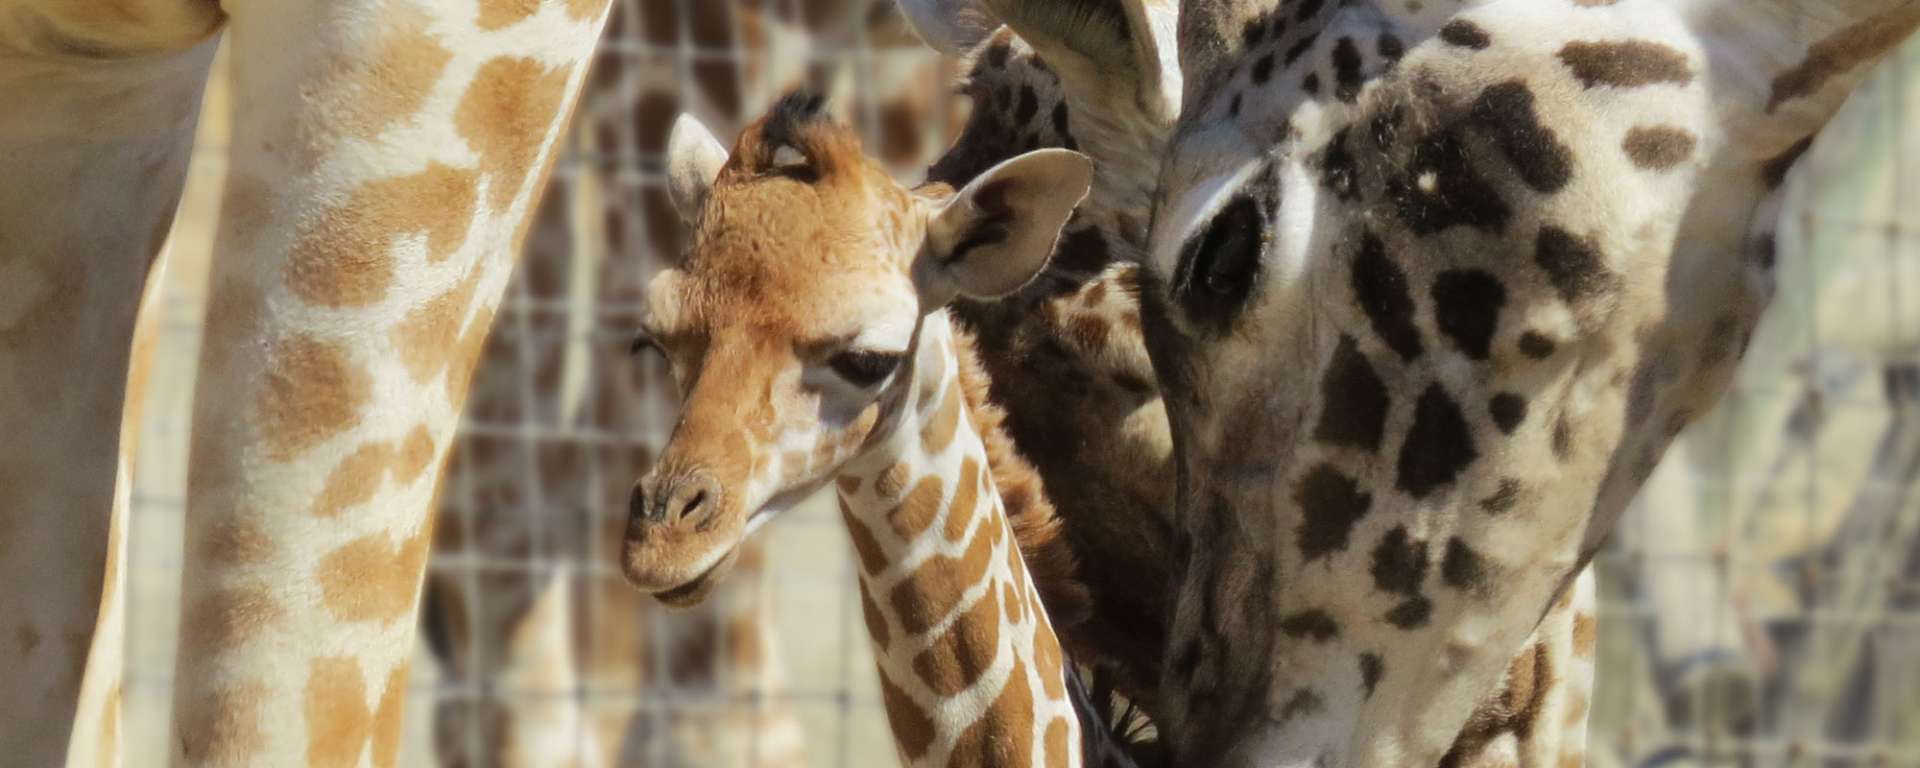 Baby Giraffe Tarra by Cheryl Crowley